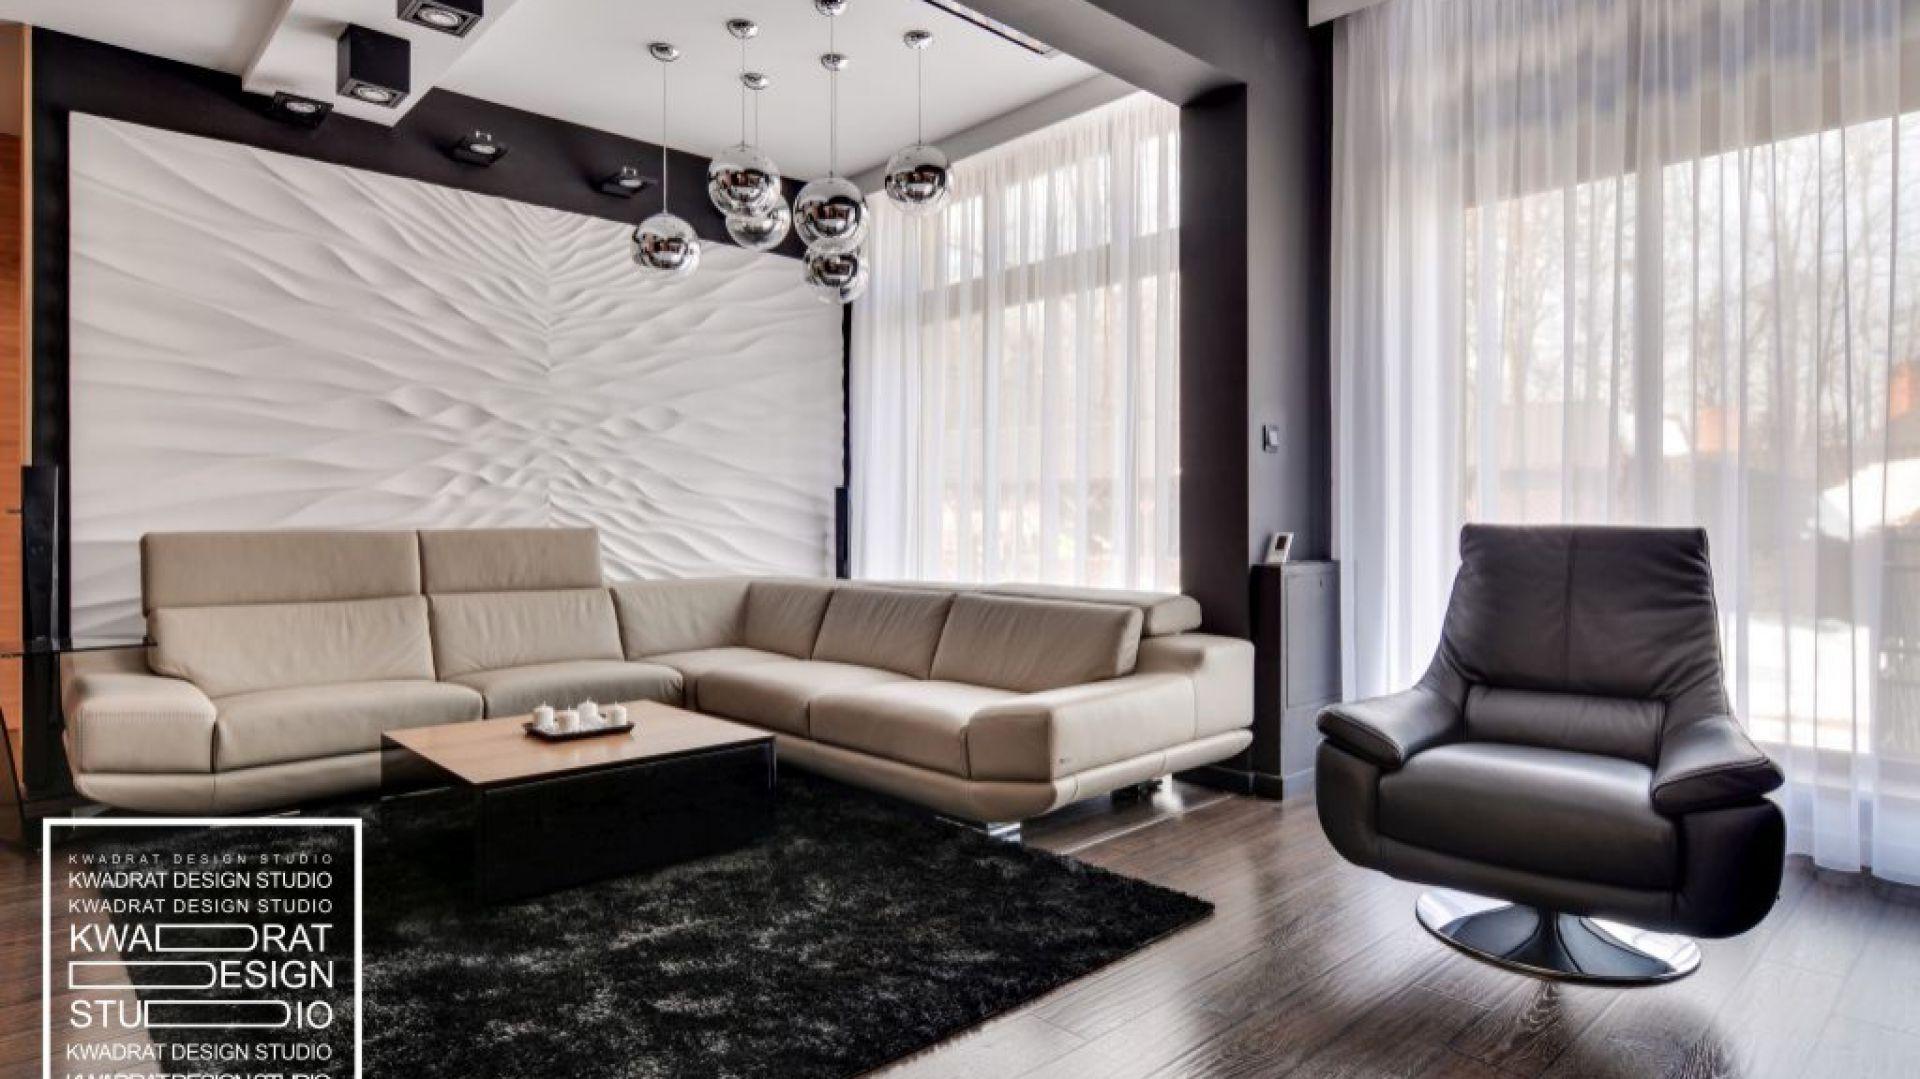 Kwadrat Design Studio. Fot. Radosław Sobik